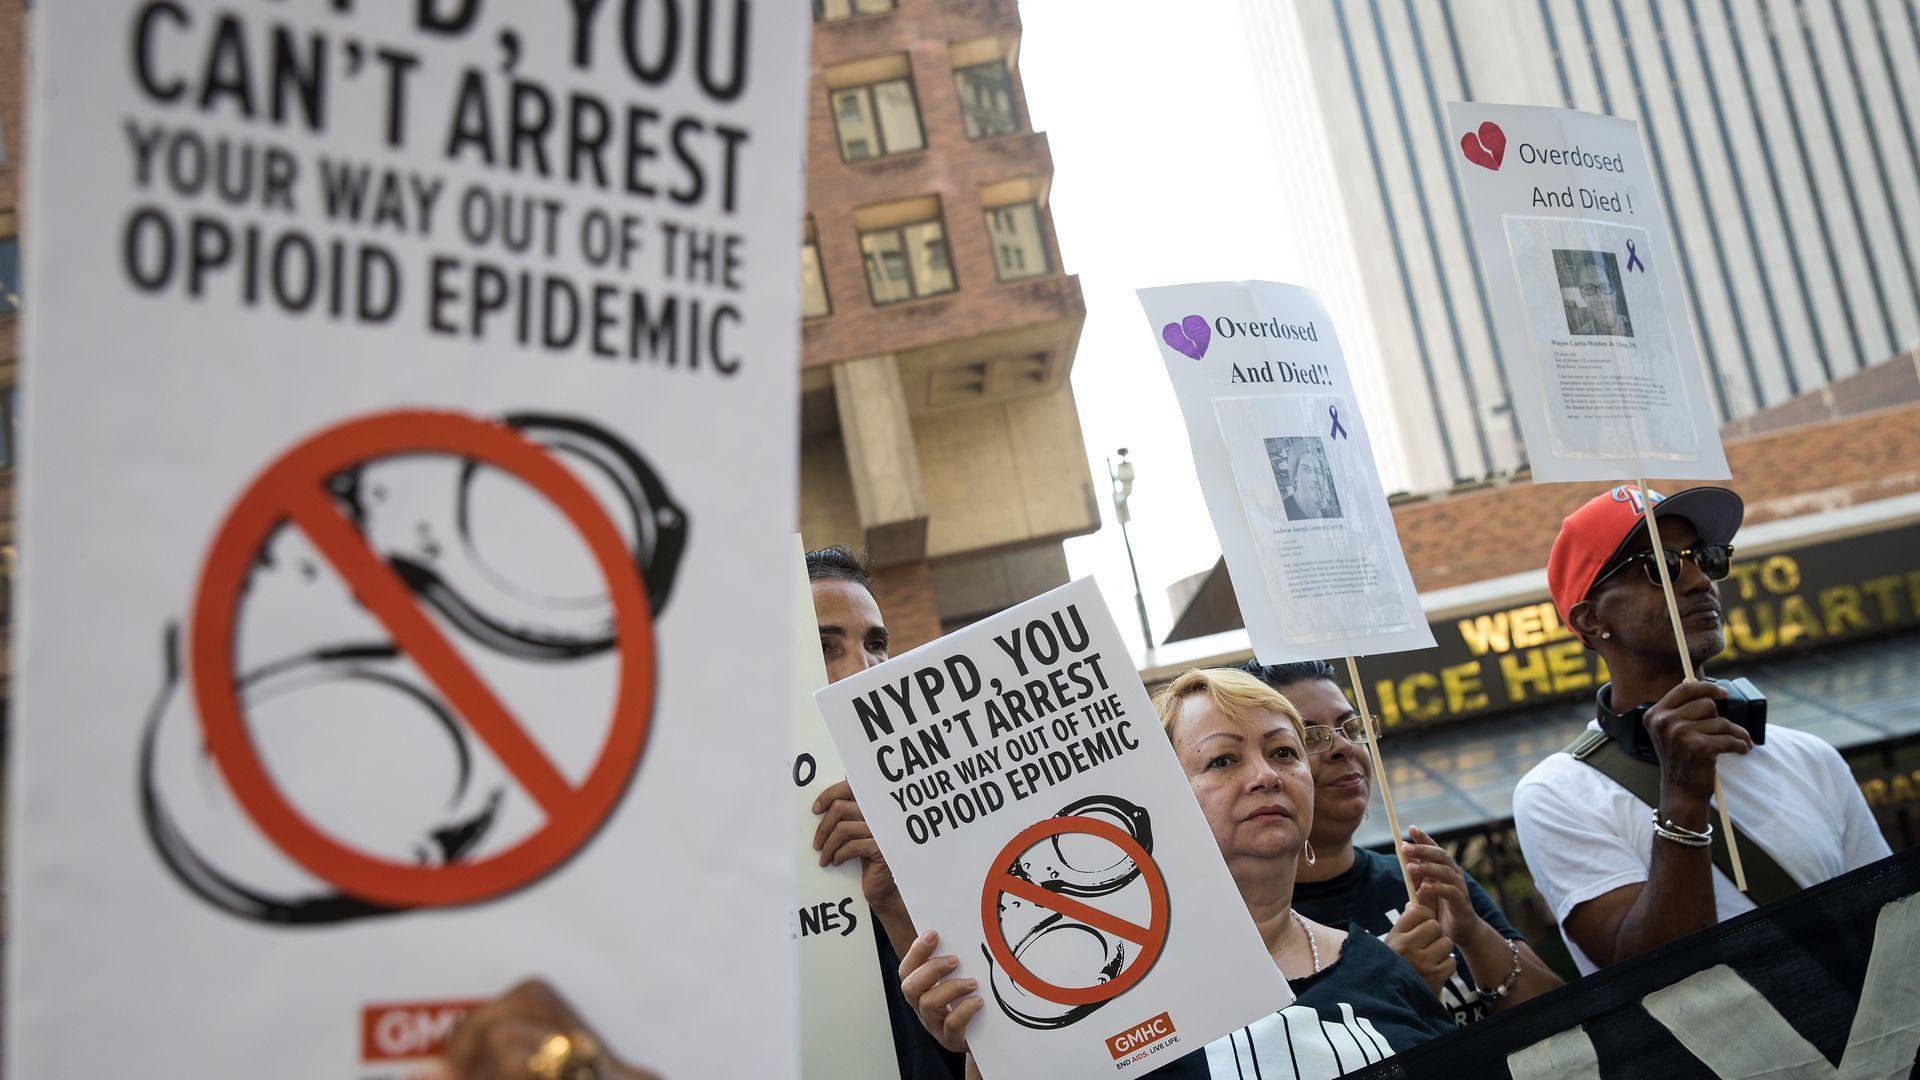 Criminal justice reform protestors